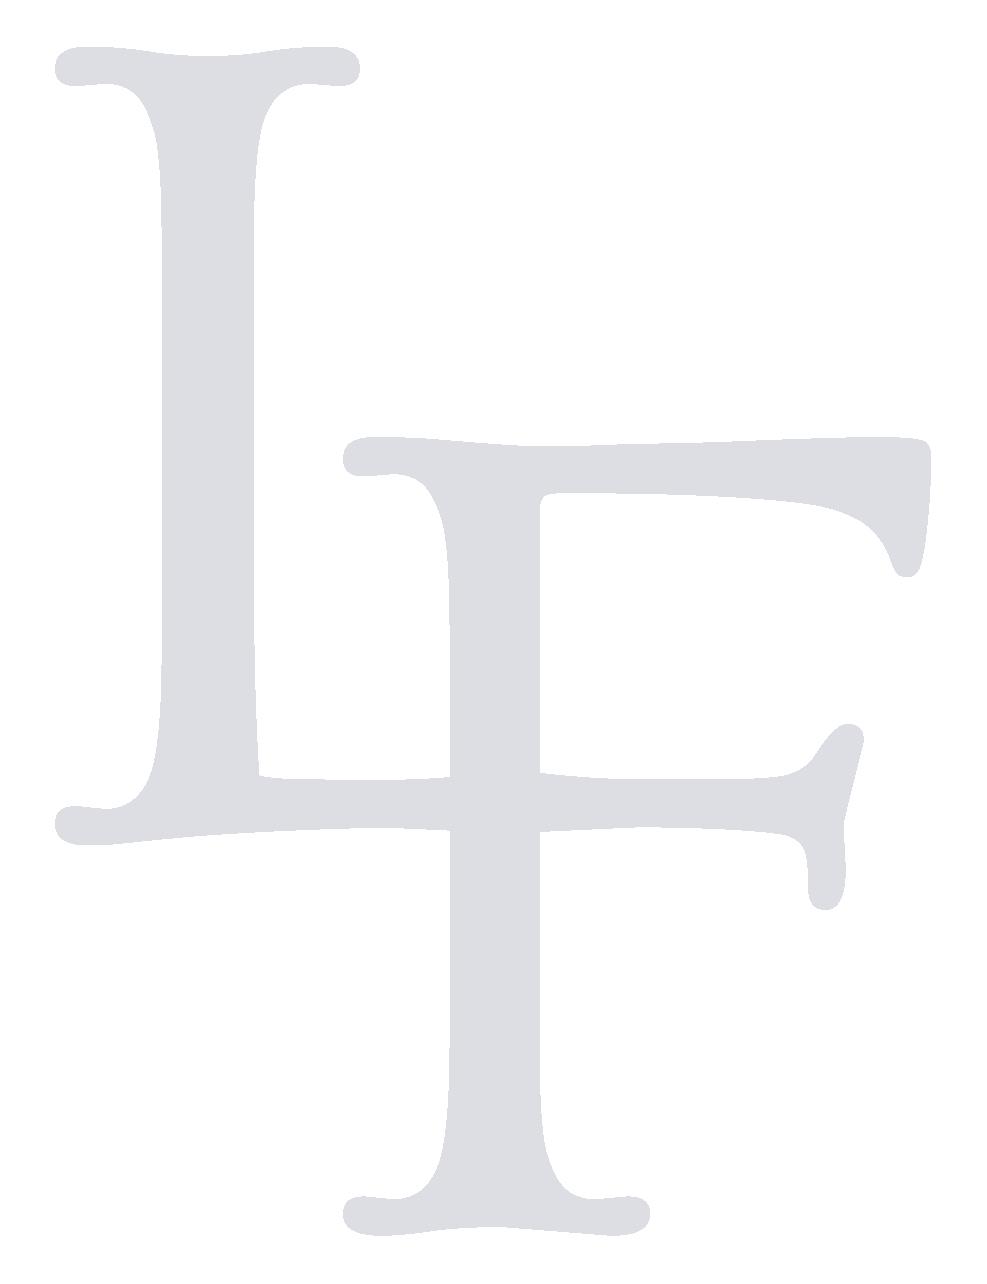 Sheet Music — LOU FELLINGHAM